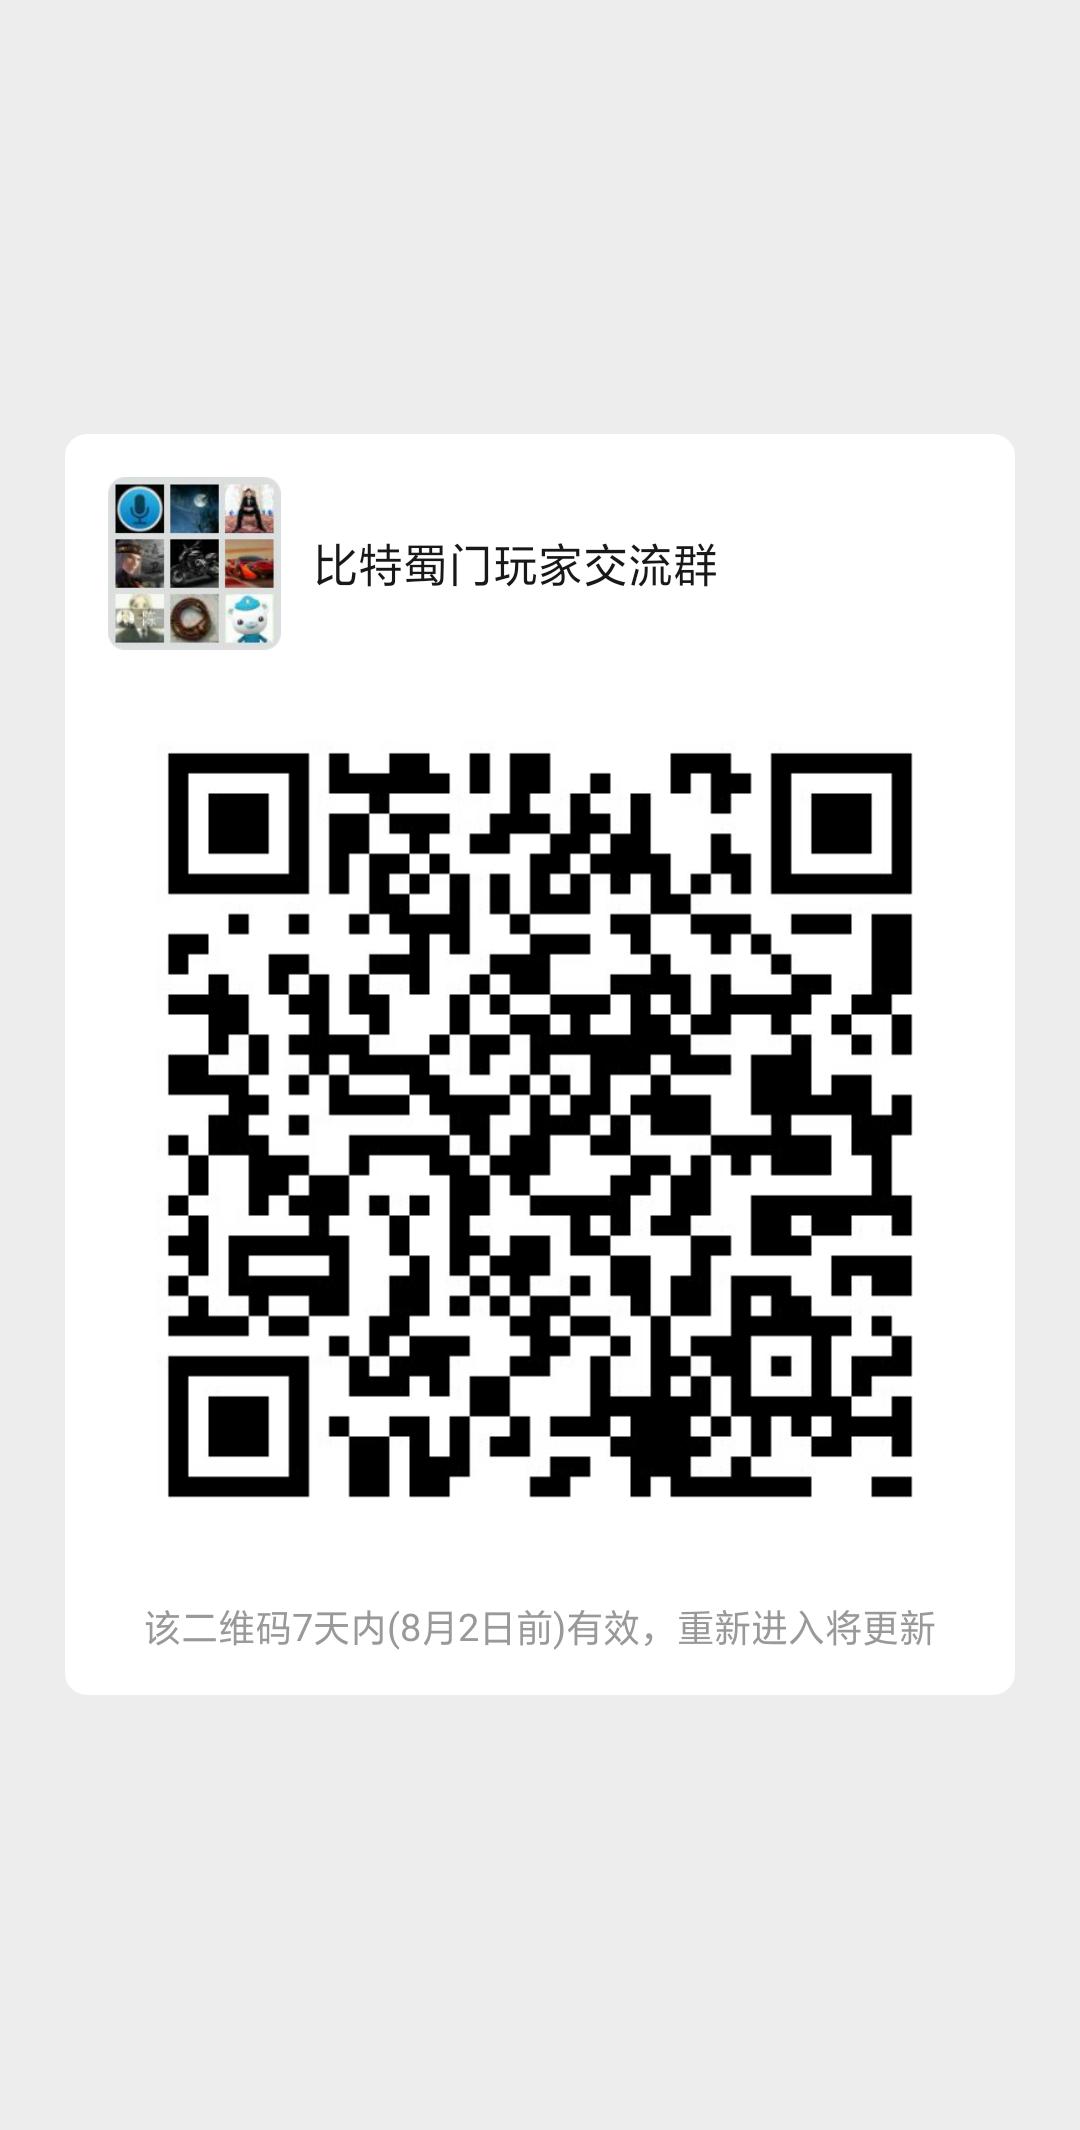 QQ图片20190726142149.png